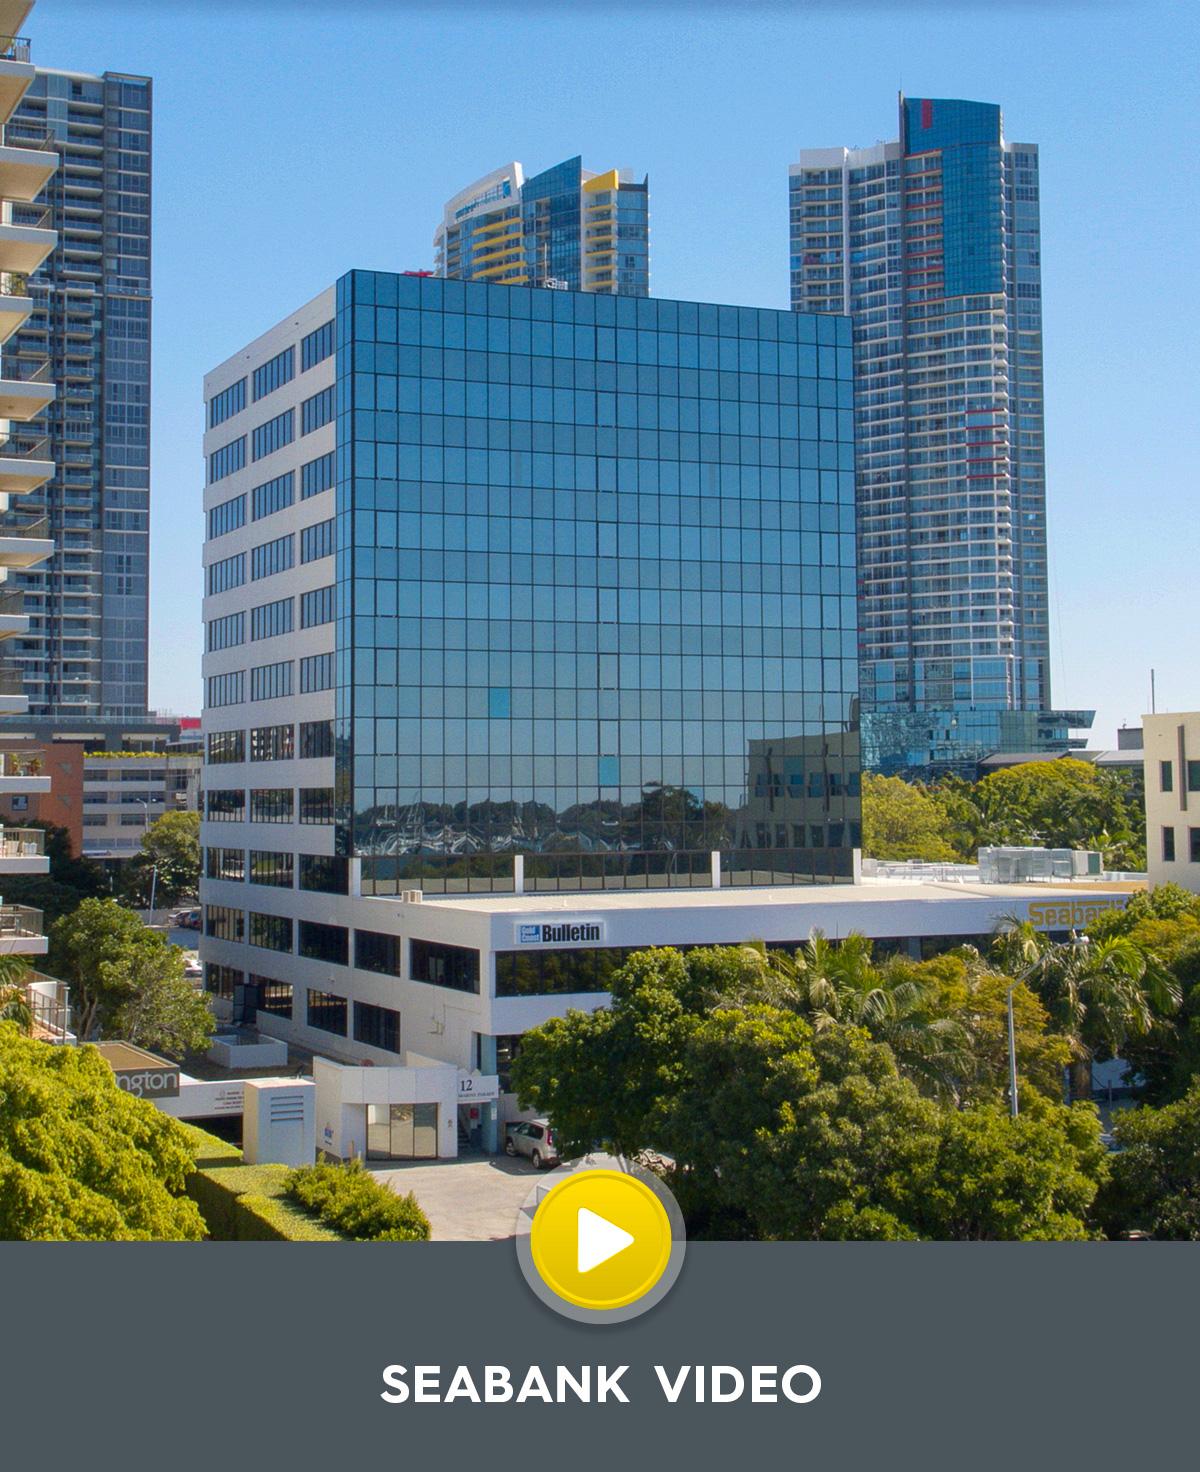 Seabank Video